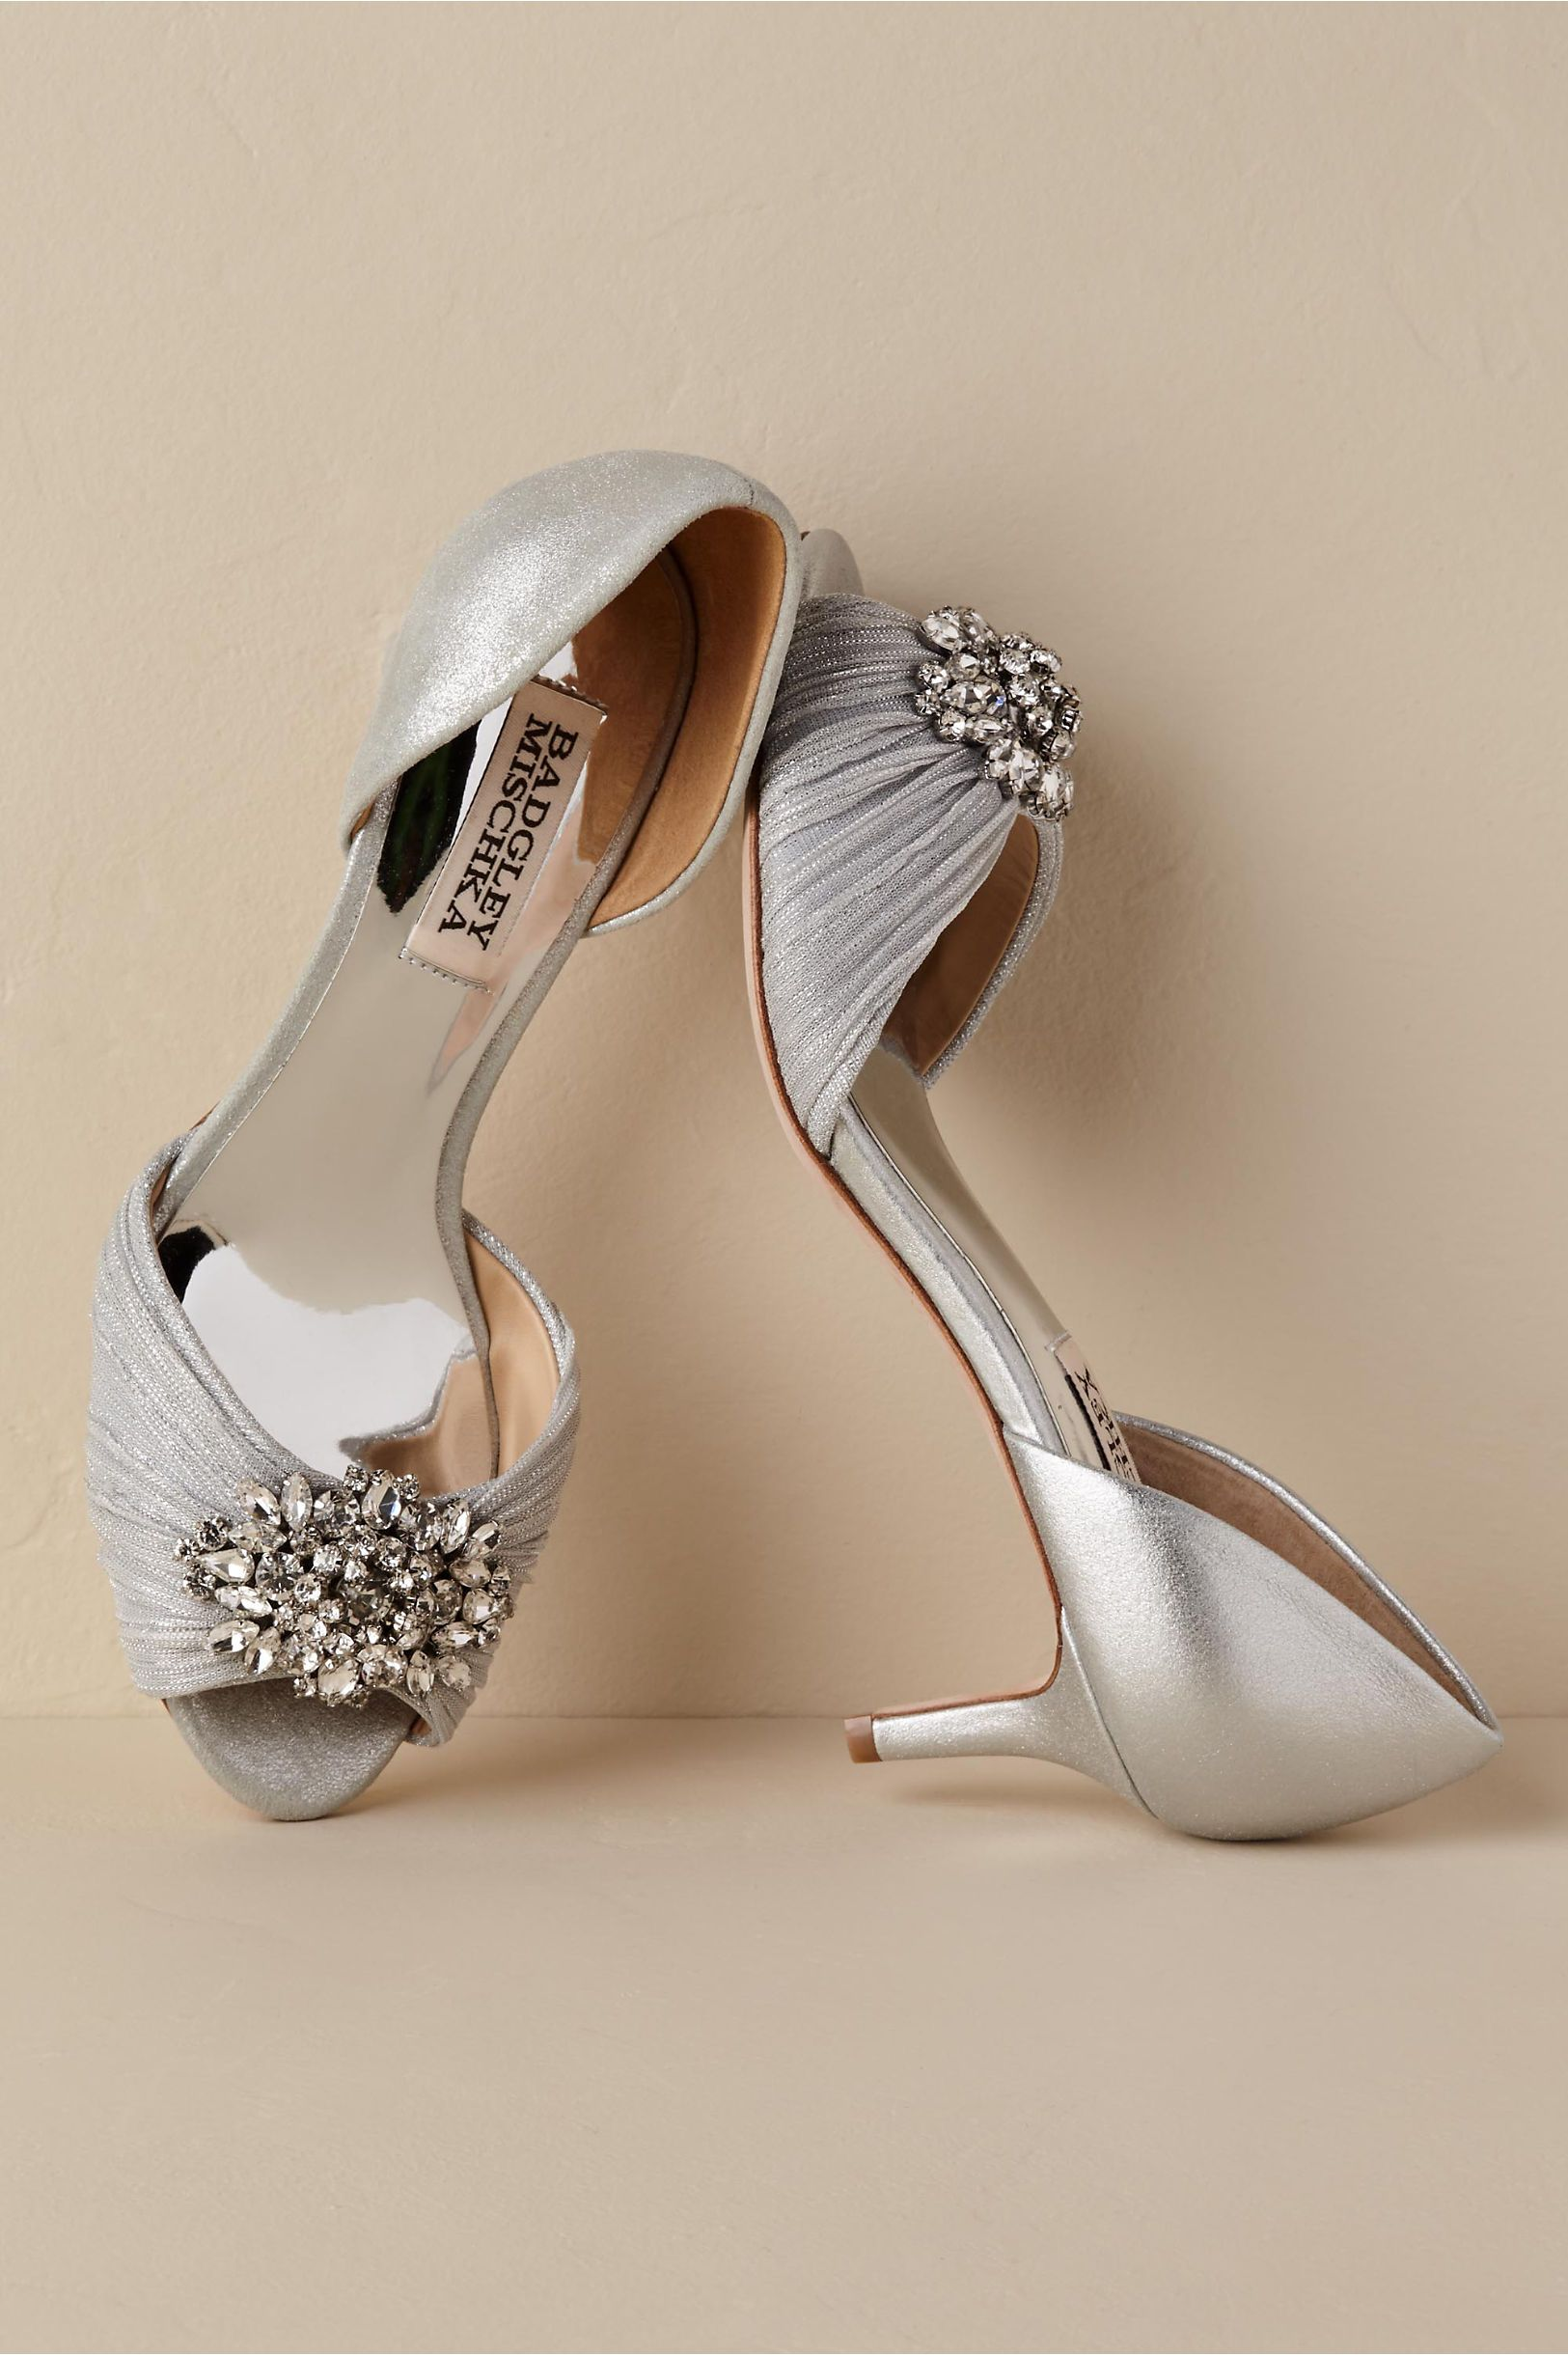 2caed6336737 BHLDN s Badgley Mischka Sabine Heels in Silver